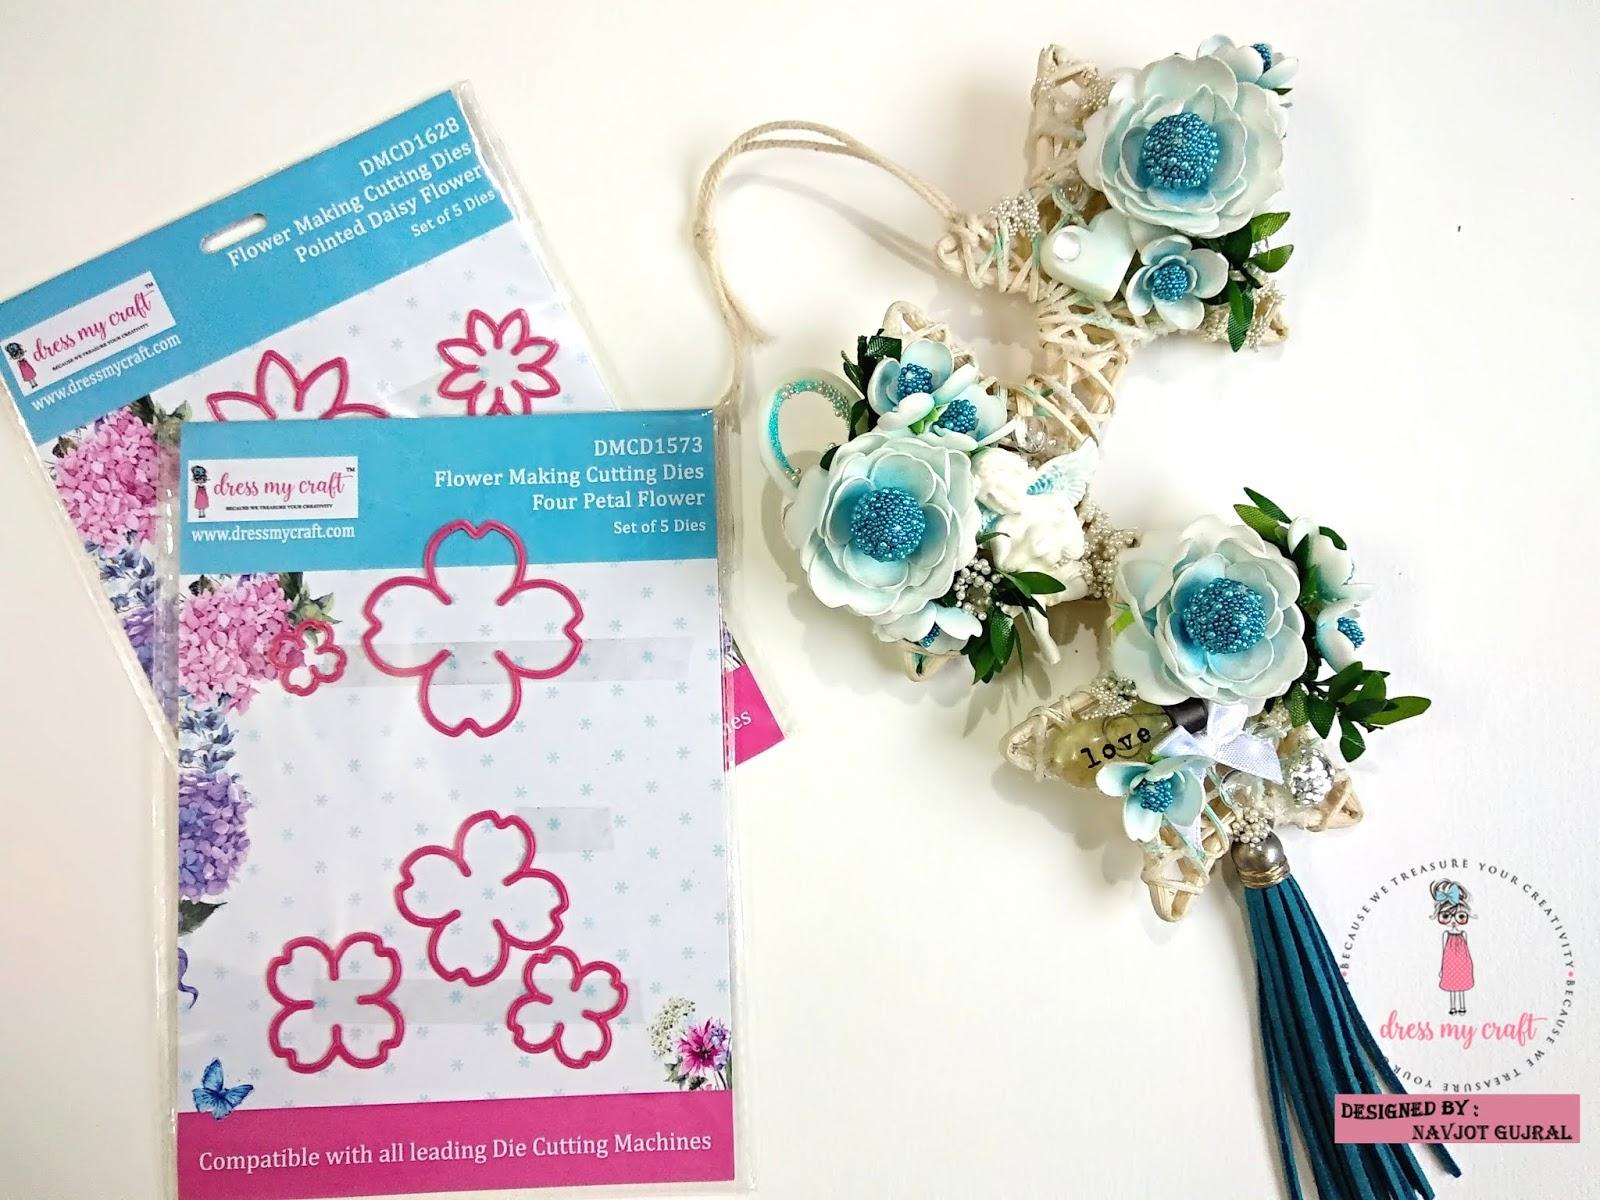 Dress My Craft Home Decor Flowers With Dress My Craft Dies